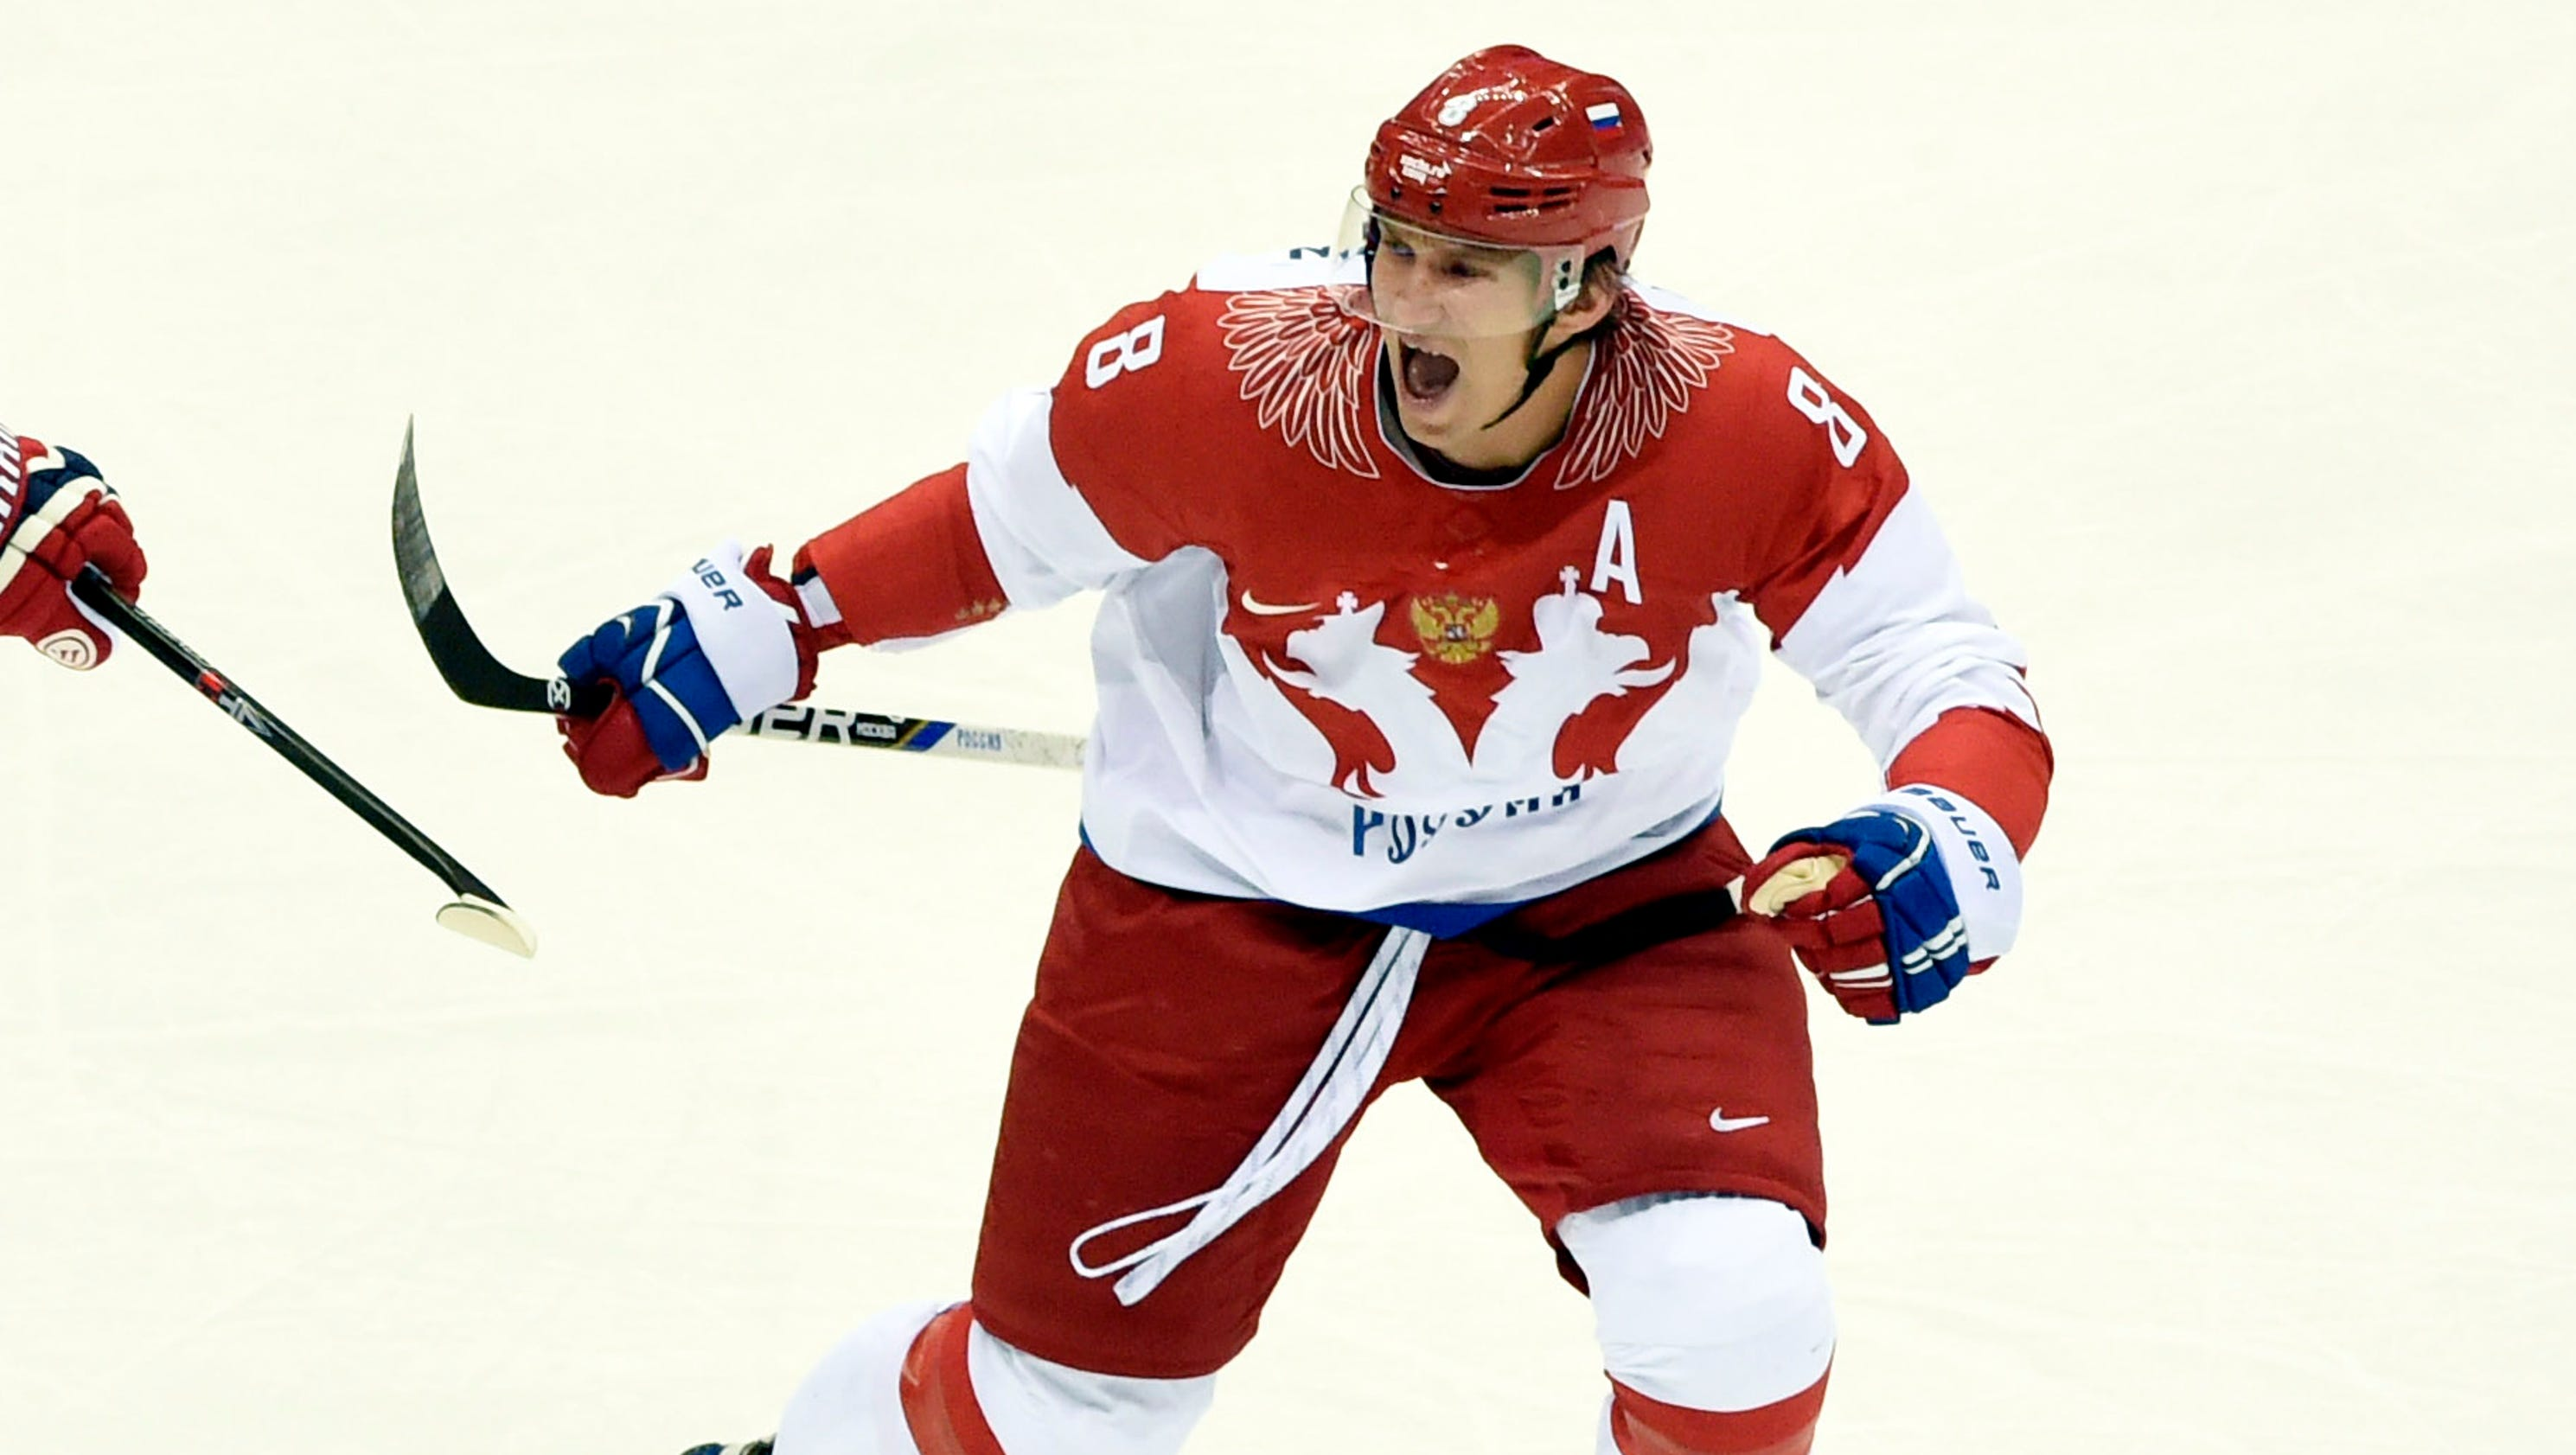 636377304485909965-usp-olympics--ice-hockey-men-s-quarterfinals-finla